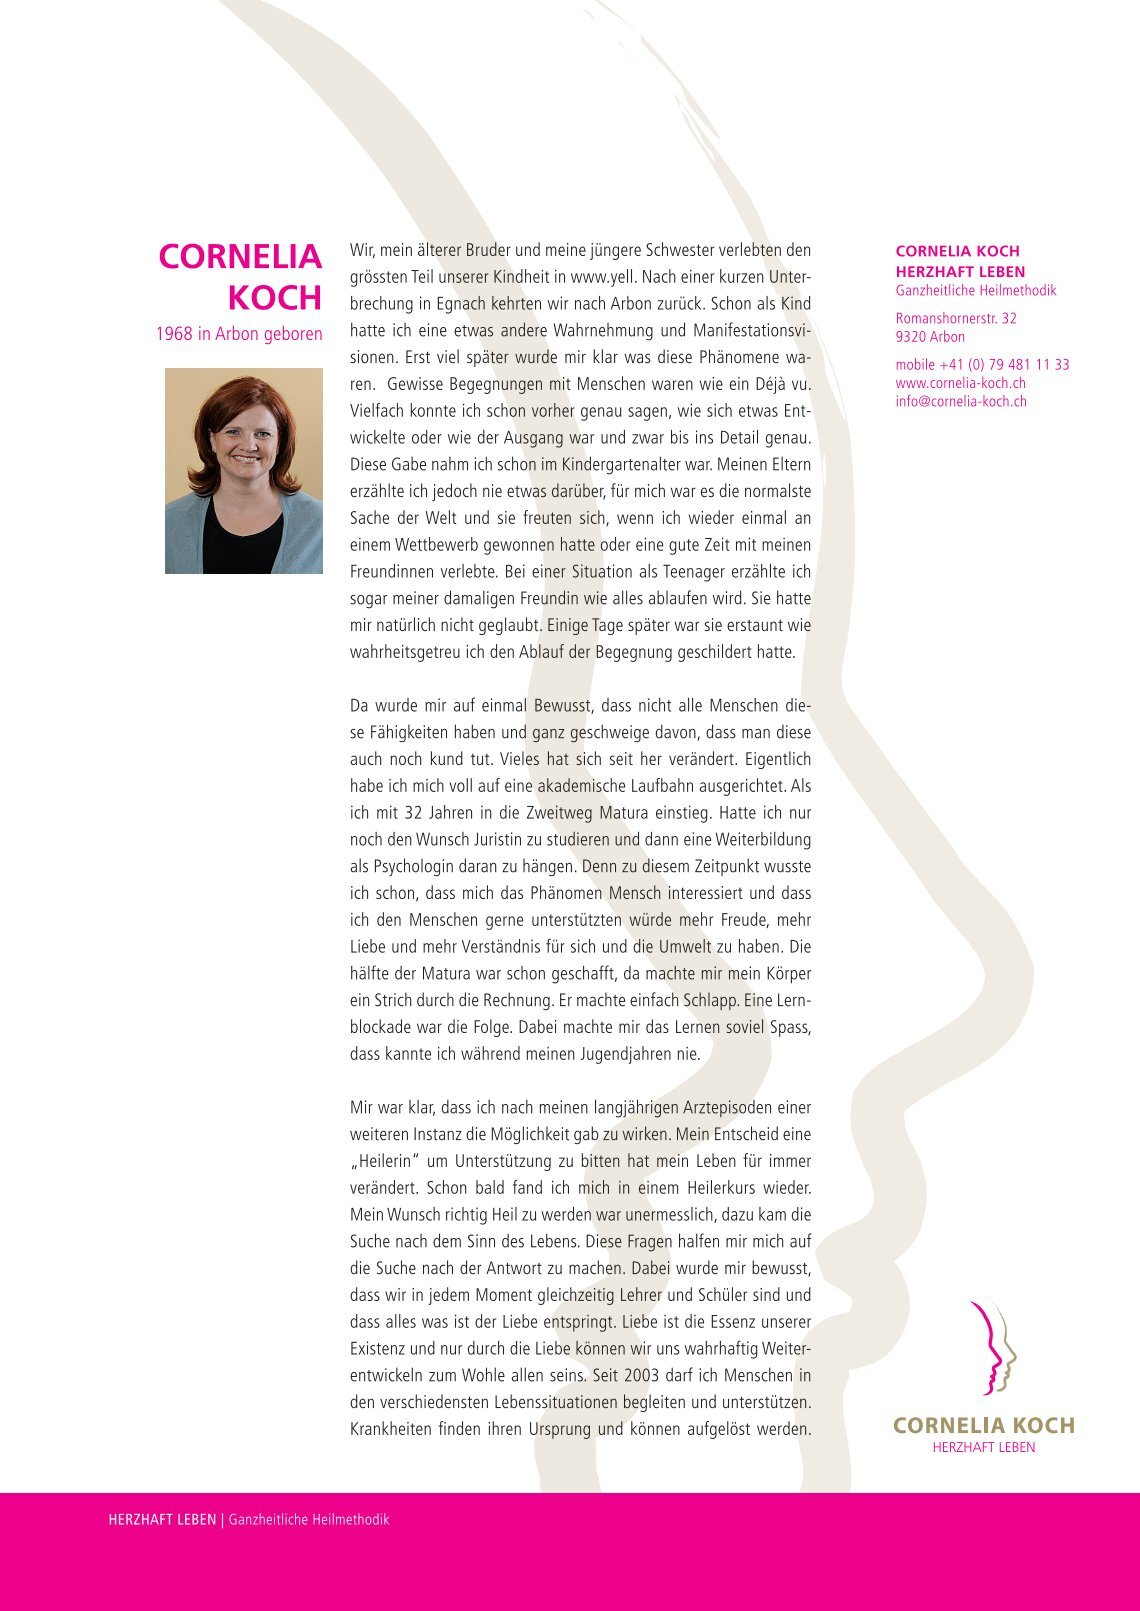 Cornelia Koch 1 free magazines from cornelia koch ch